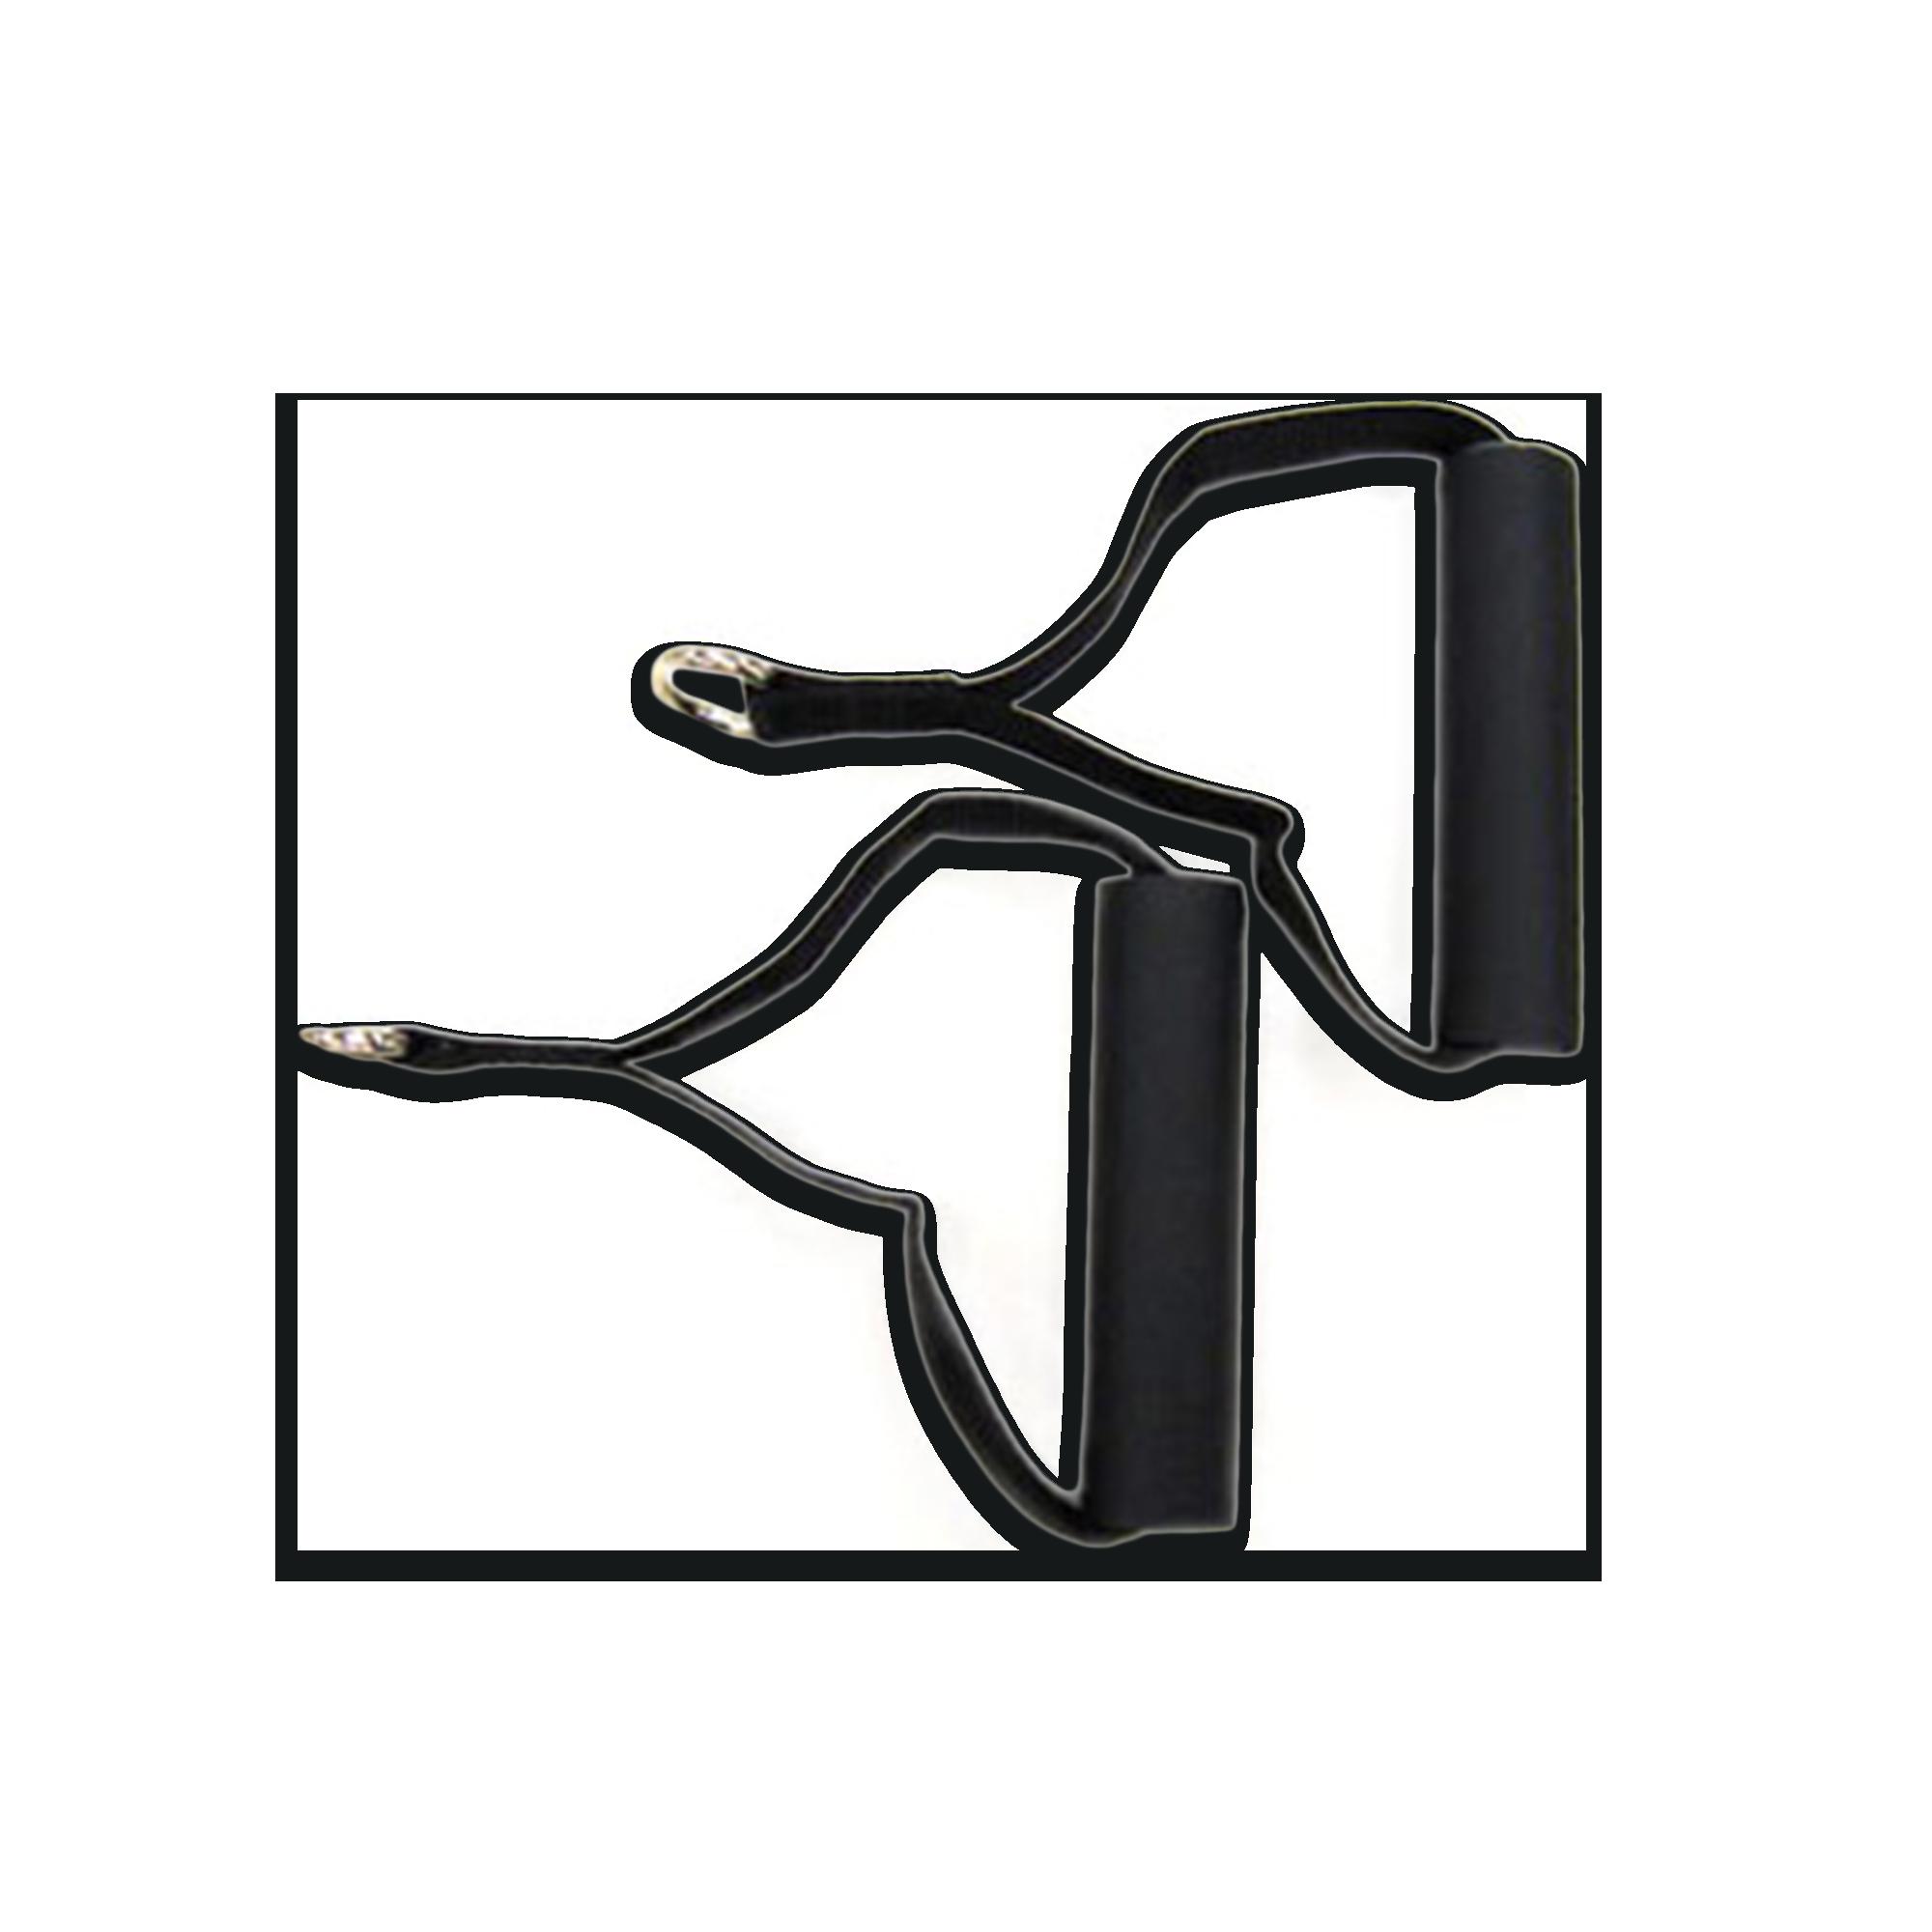 Details about  /Bowflex Revolution Style Adjustable Hand Grips Handles Brand New Pair